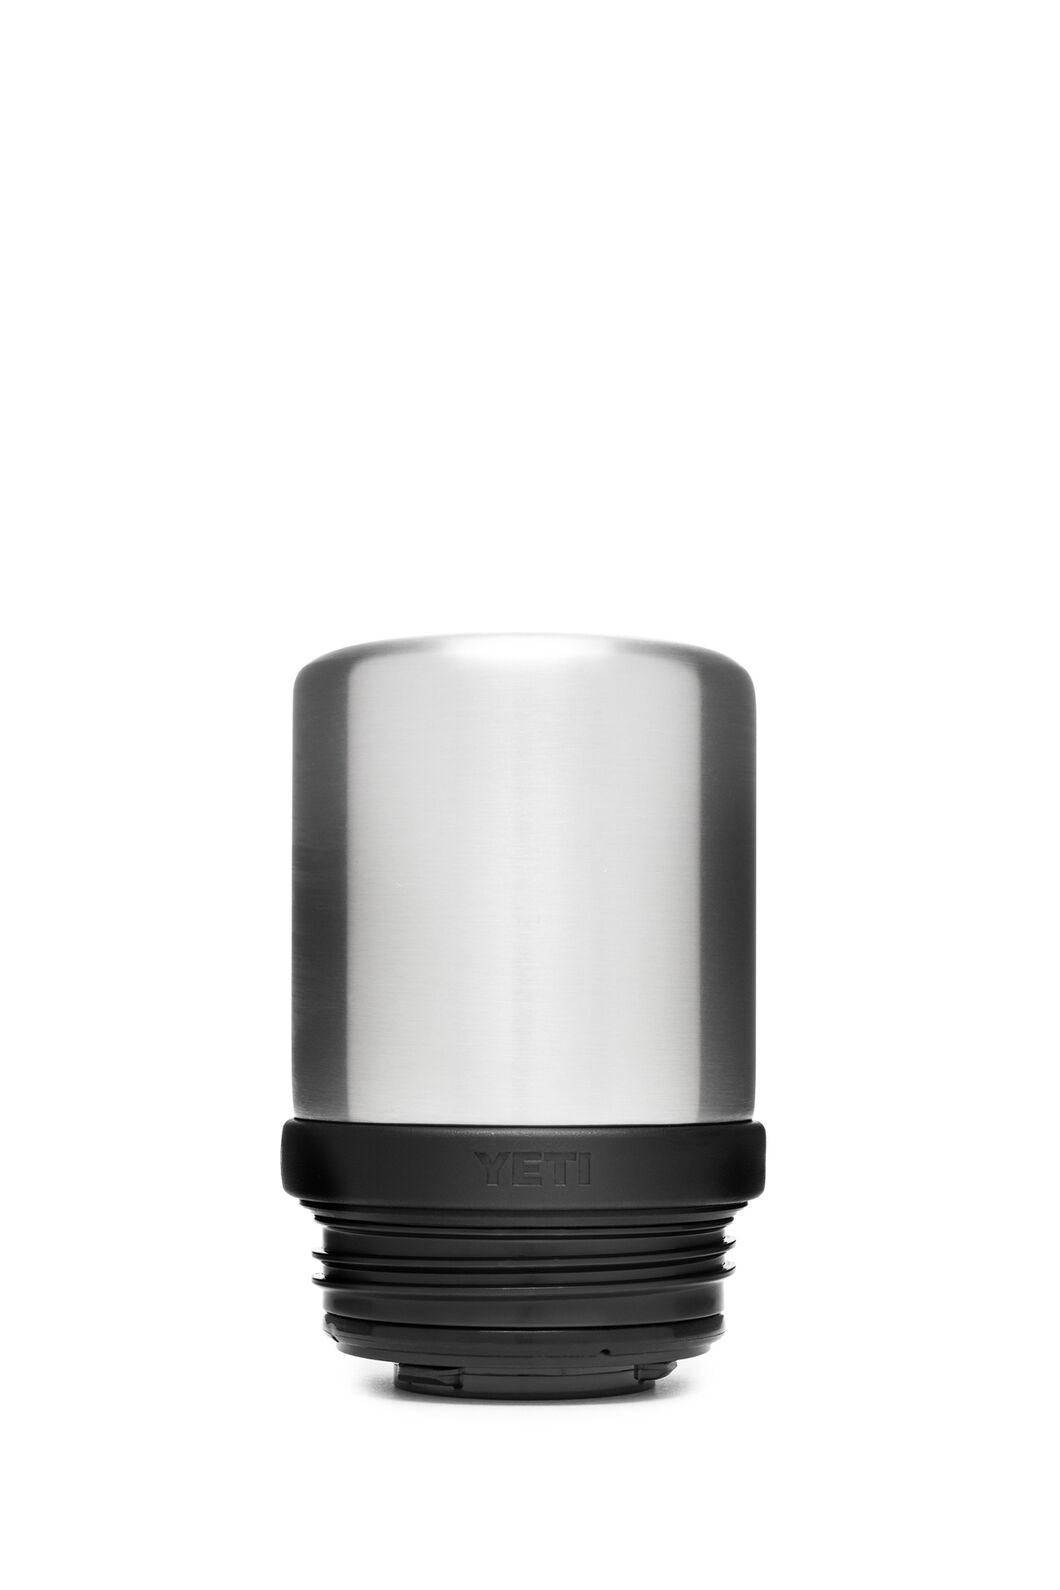 Yeti Rambler Bottle Cup Cap, None, hi-res